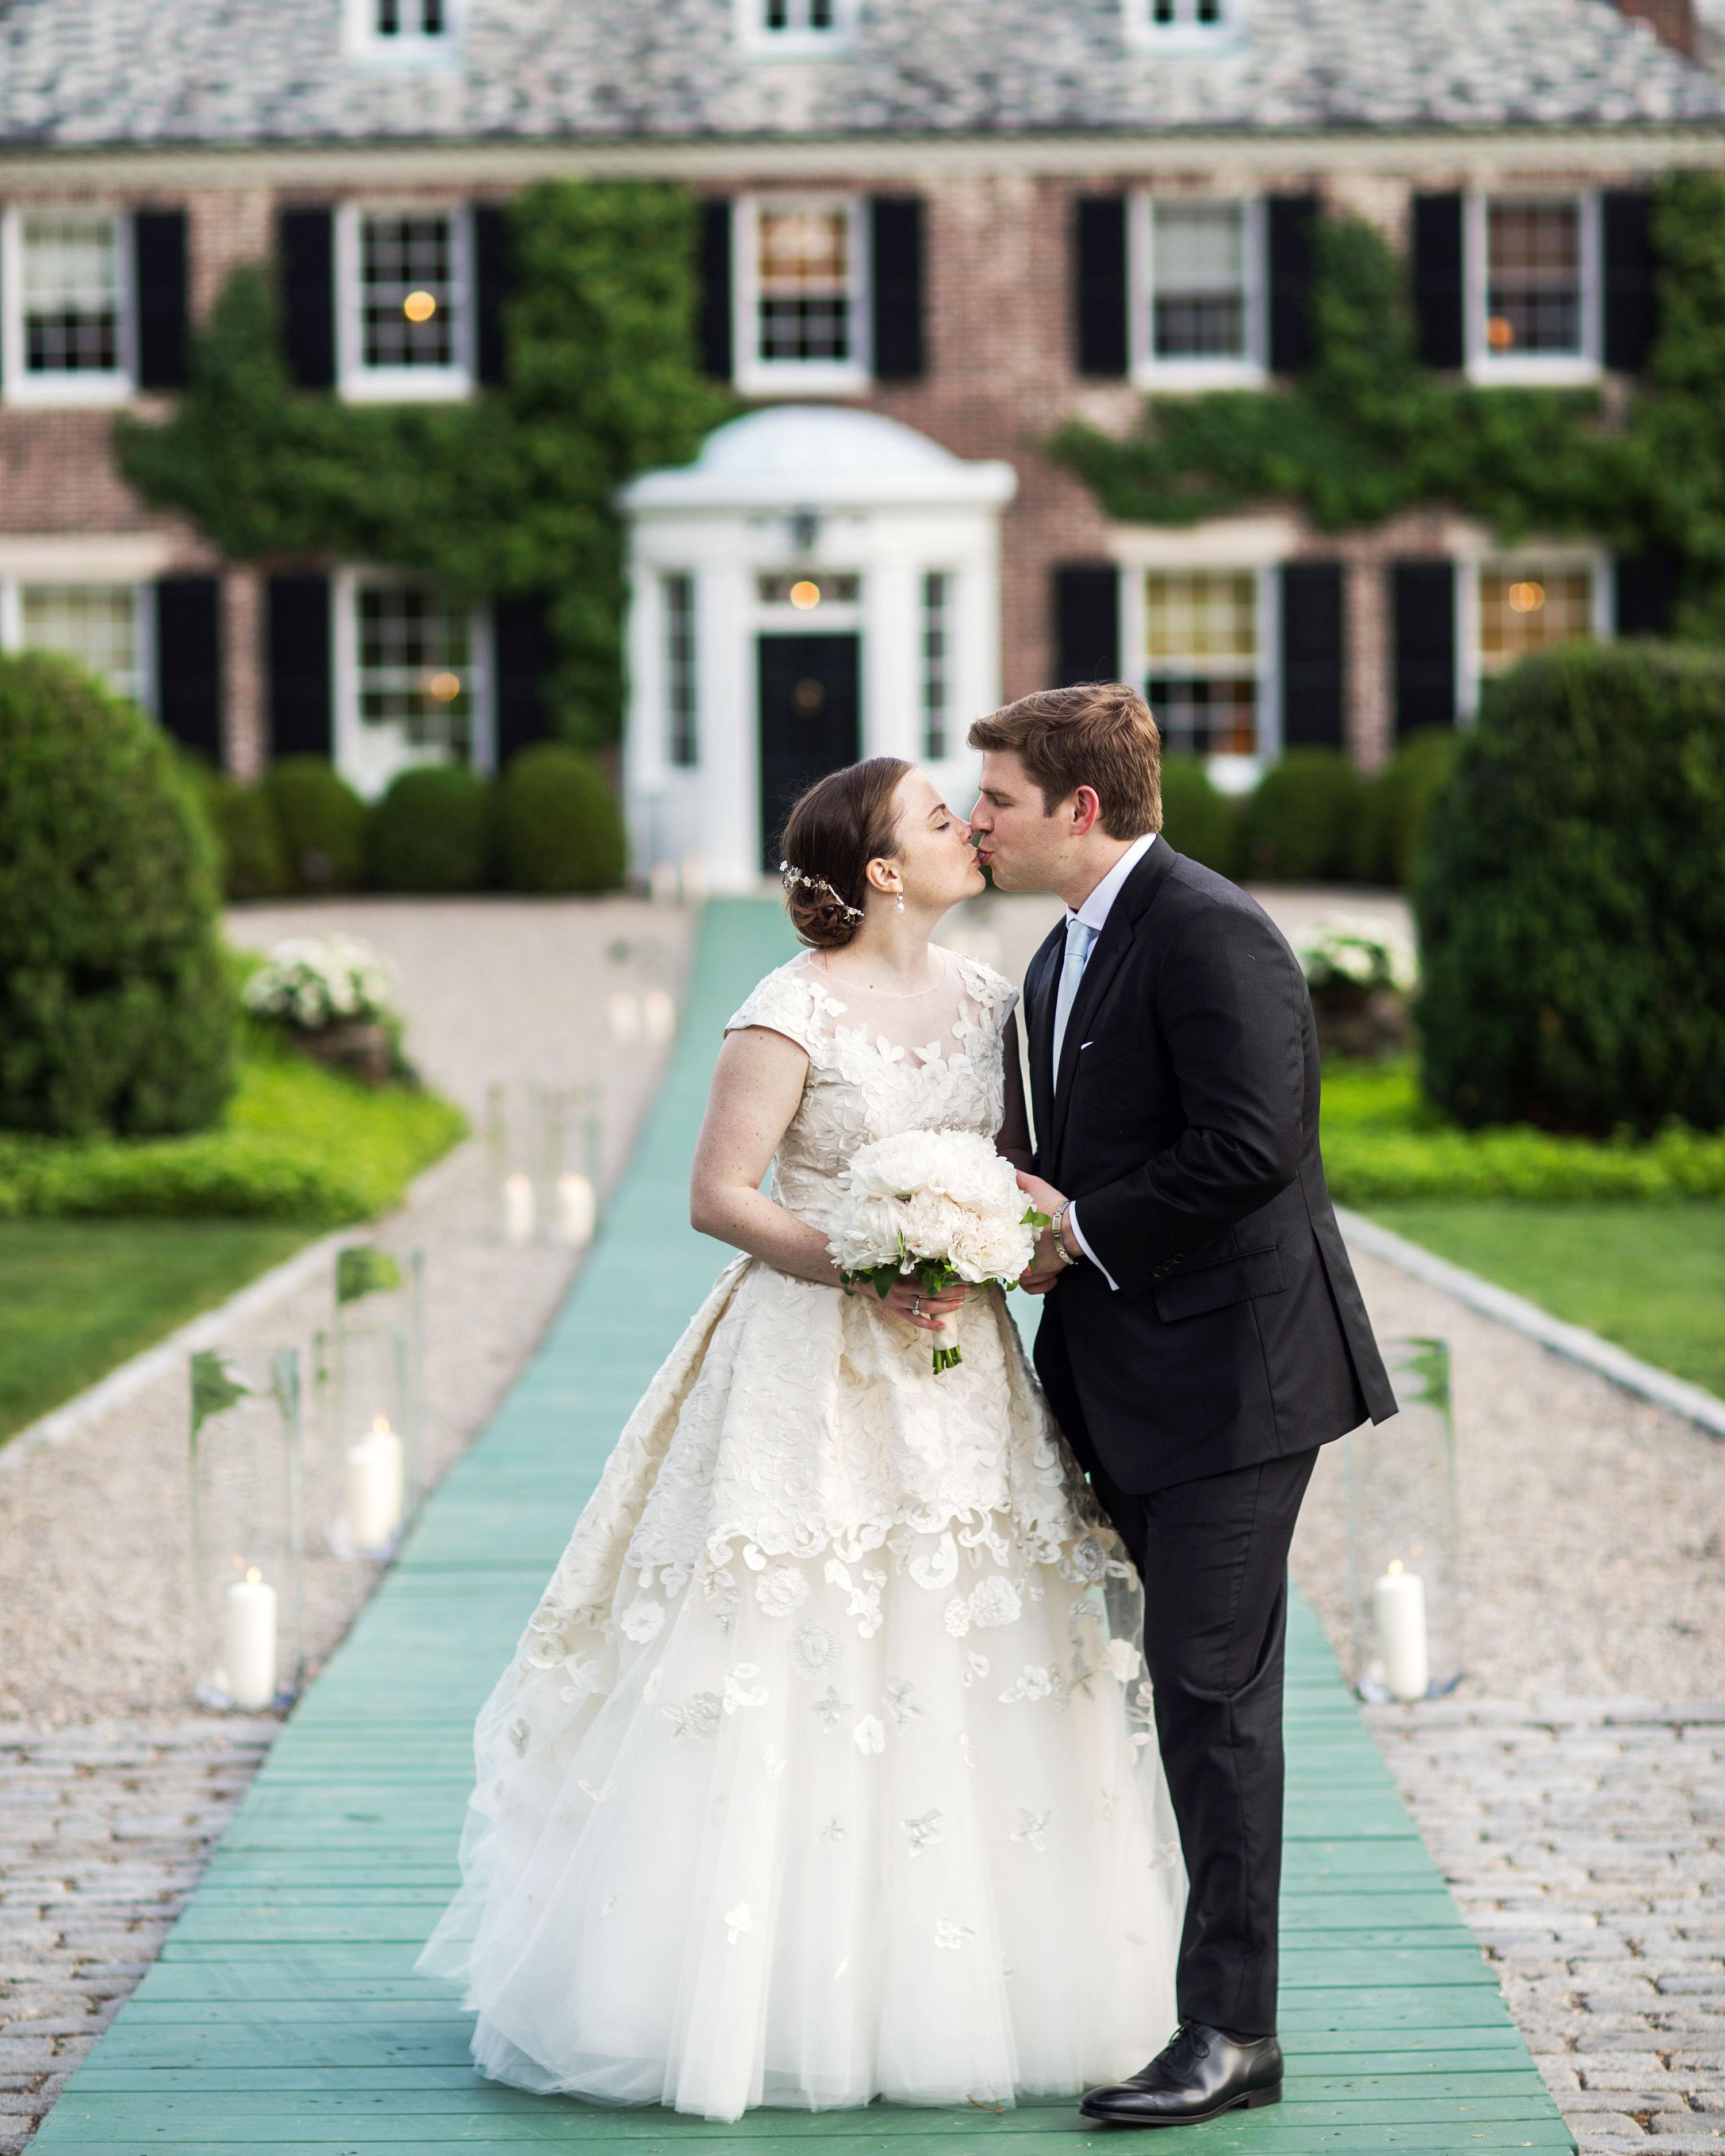 emily-matthew-wedding-couple-kiss-0144-s112720-0316.jpg